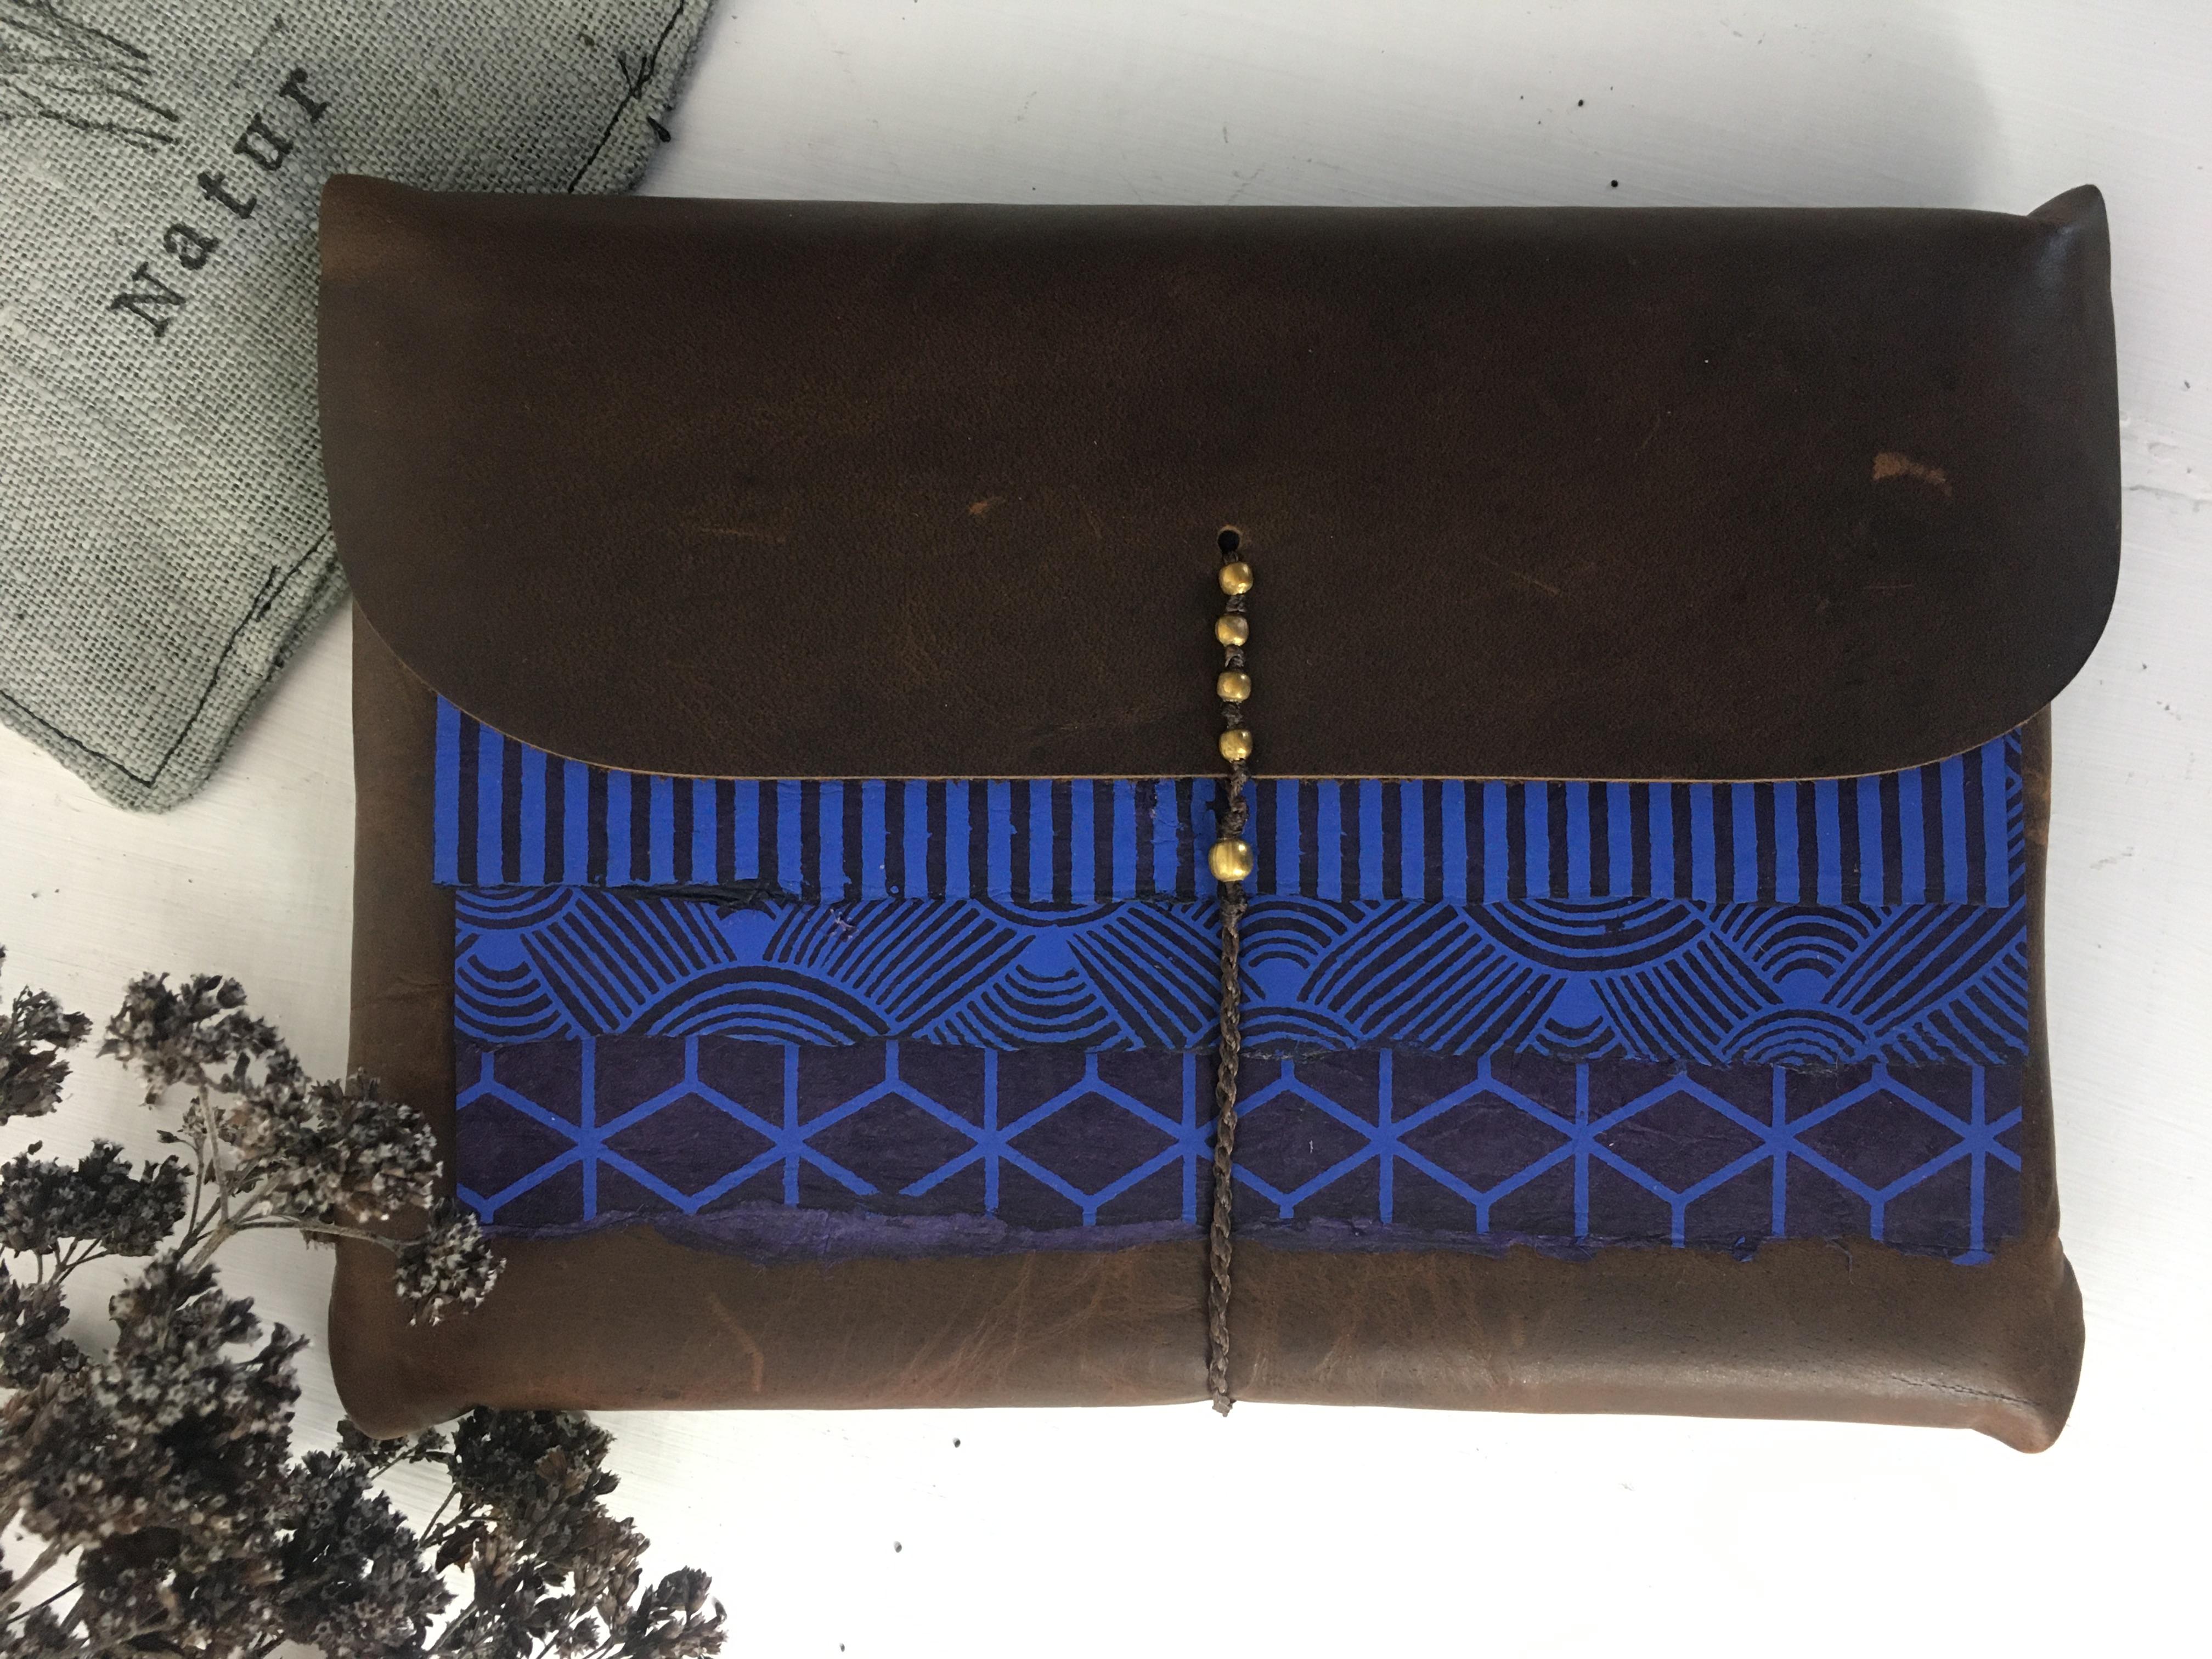 Notizbuch echtes Leder Handarbeit 11 x 15 cm Blau